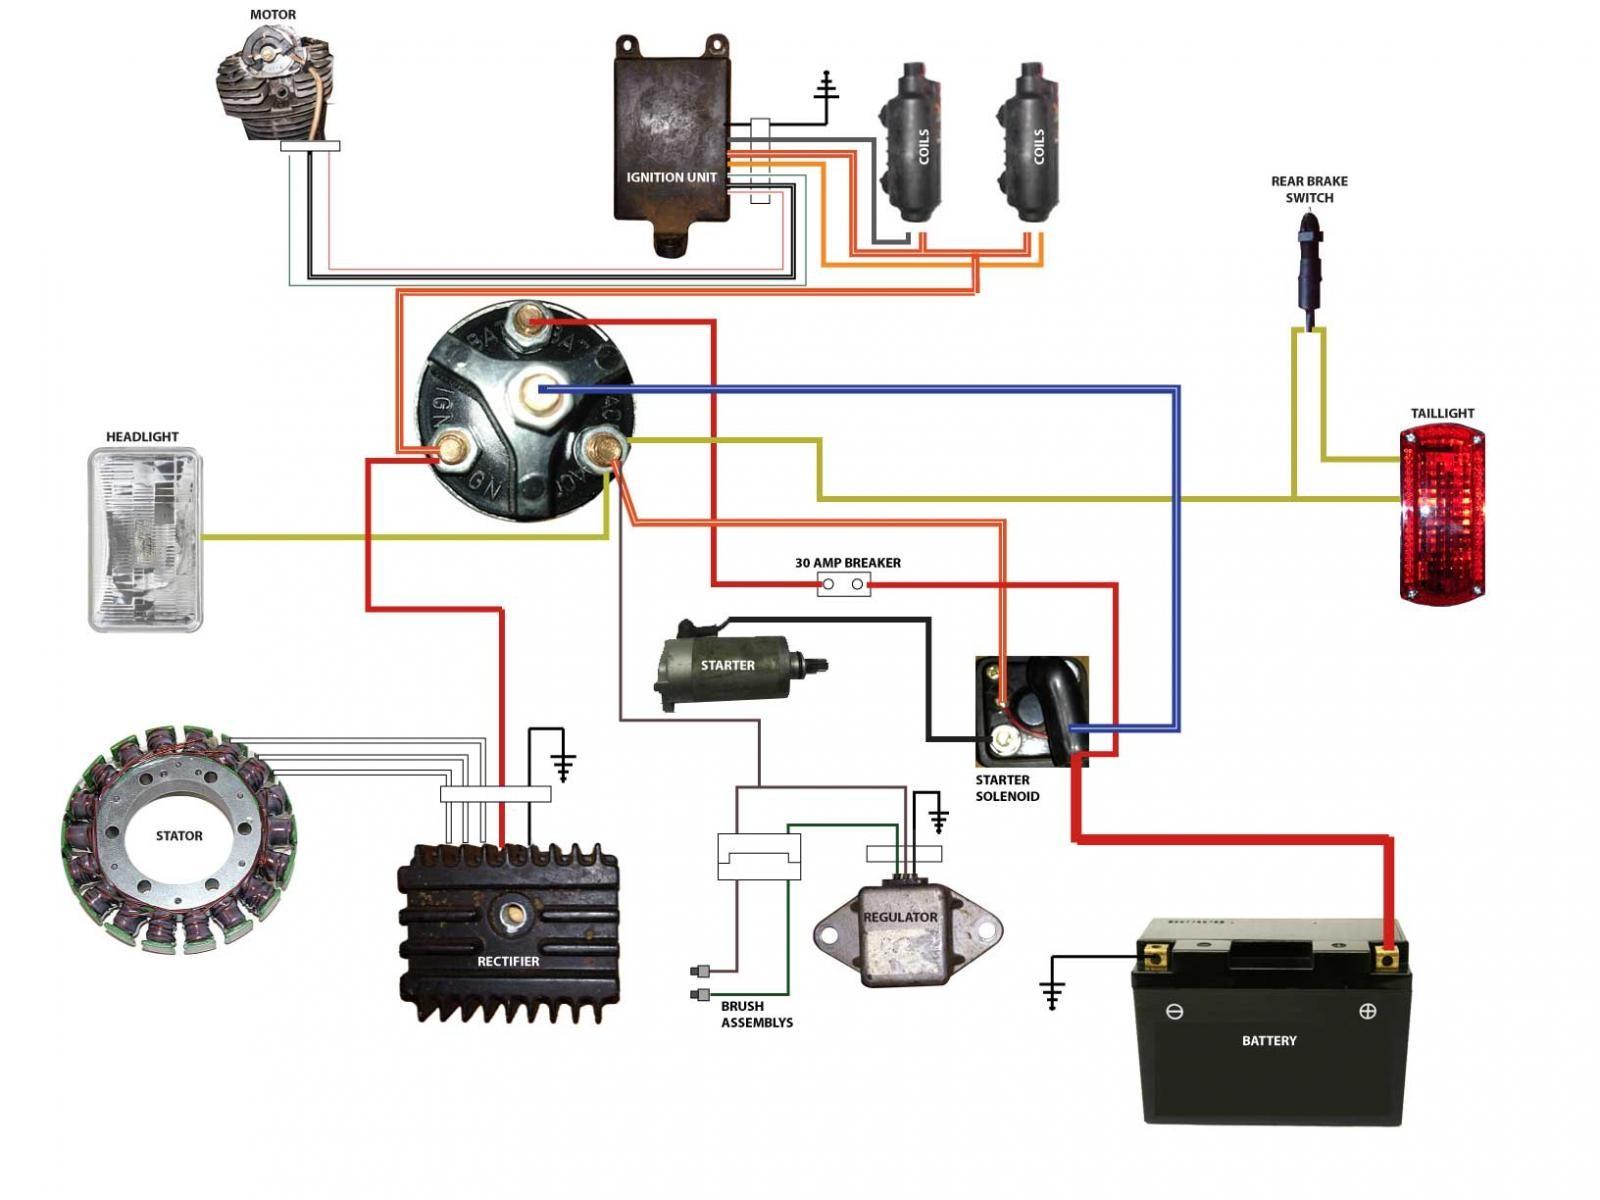 Honda Cb750 Bobber Wiring Trusted Wiring Diagrams Honda CB750 Ignition  Wiring 1980 Honda Cb750 Wire Diagram Coil